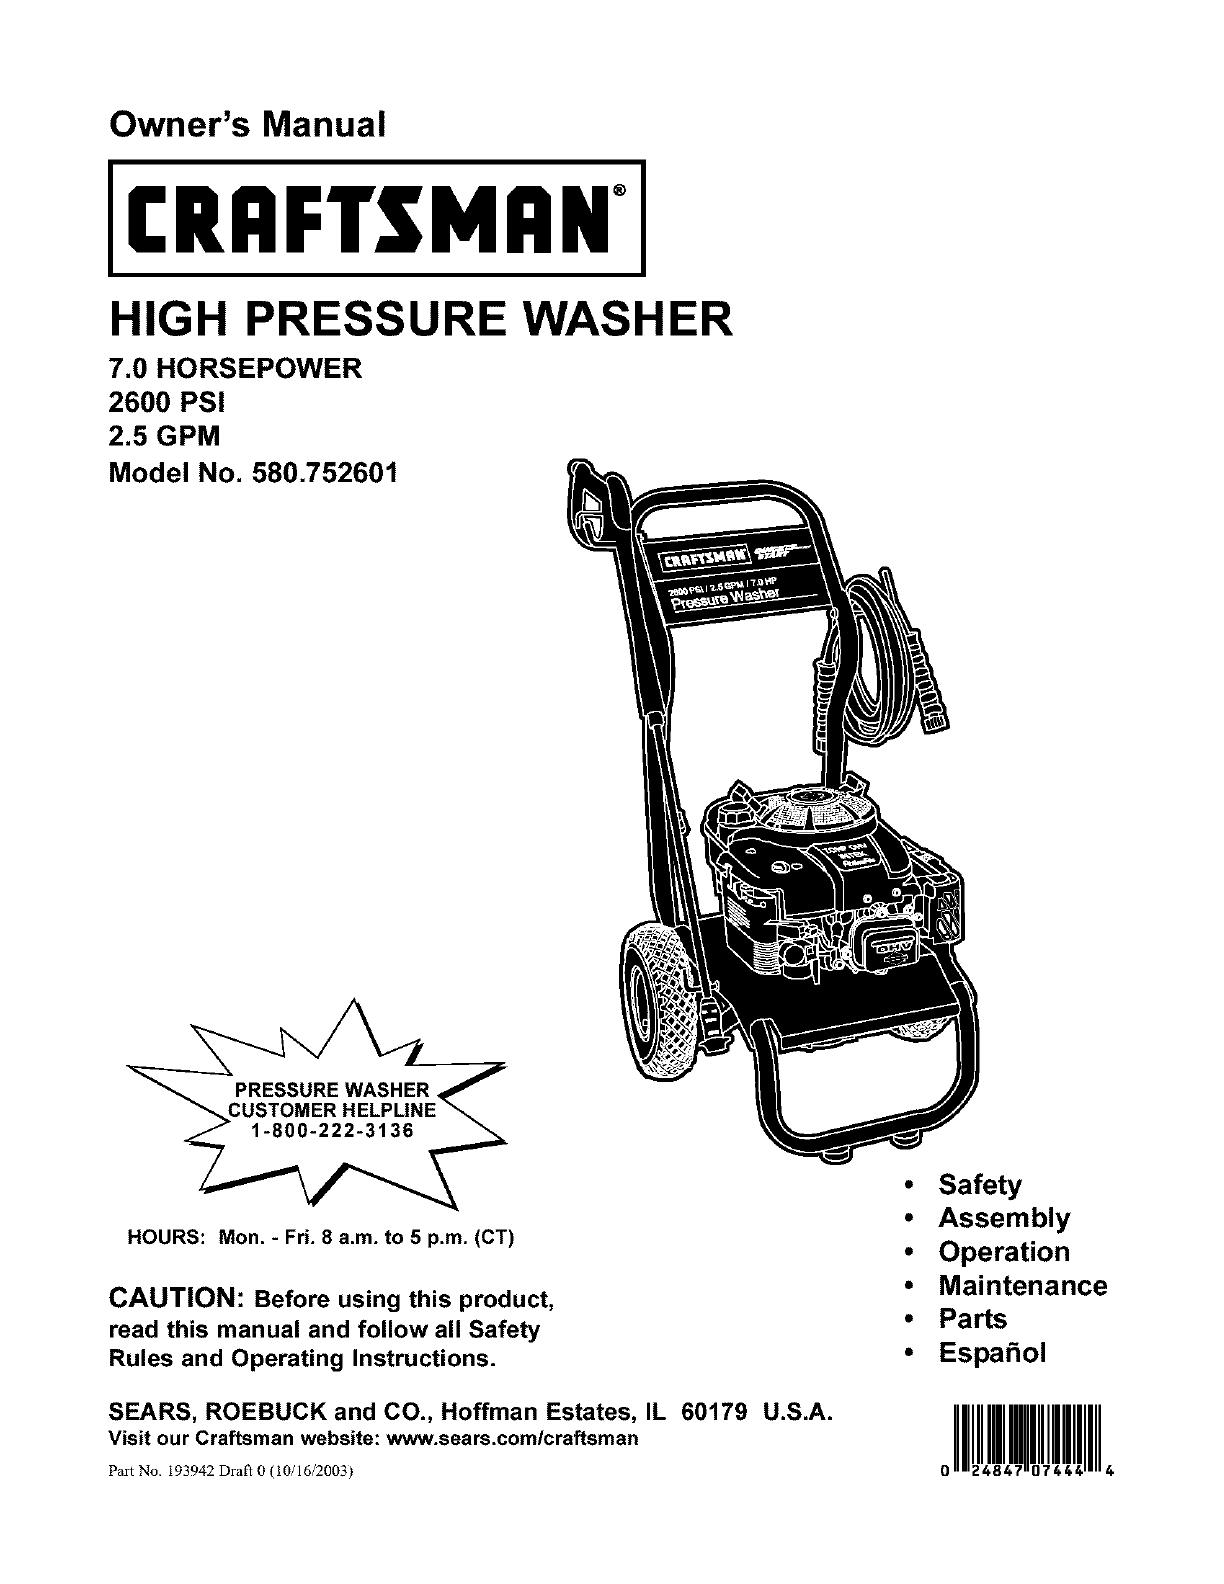 craftsman 580752601 user manual pressure washer manuals and guides rh usermanual wiki Craftsman Pressure Washer Parts Breakdown Craftsman Pressure Washer Parts Breakdown